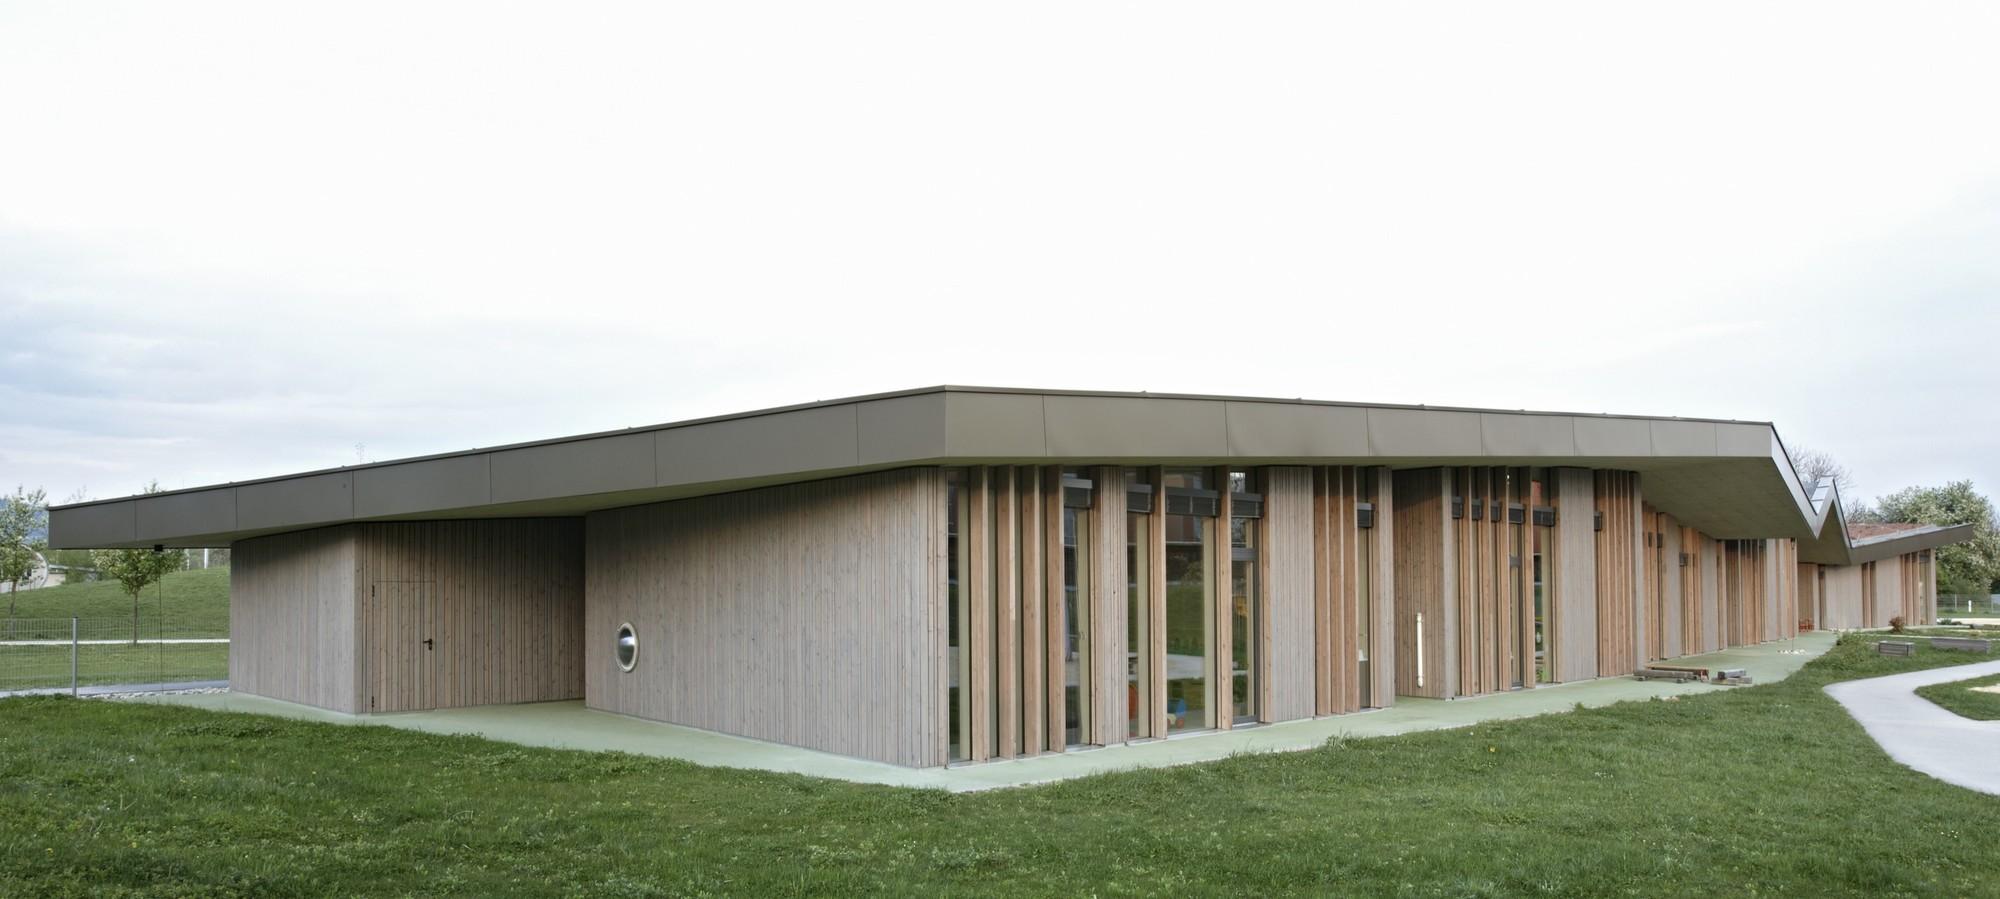 Jardín infantil Solarcity / x architekten, © Elisabeth Grebe